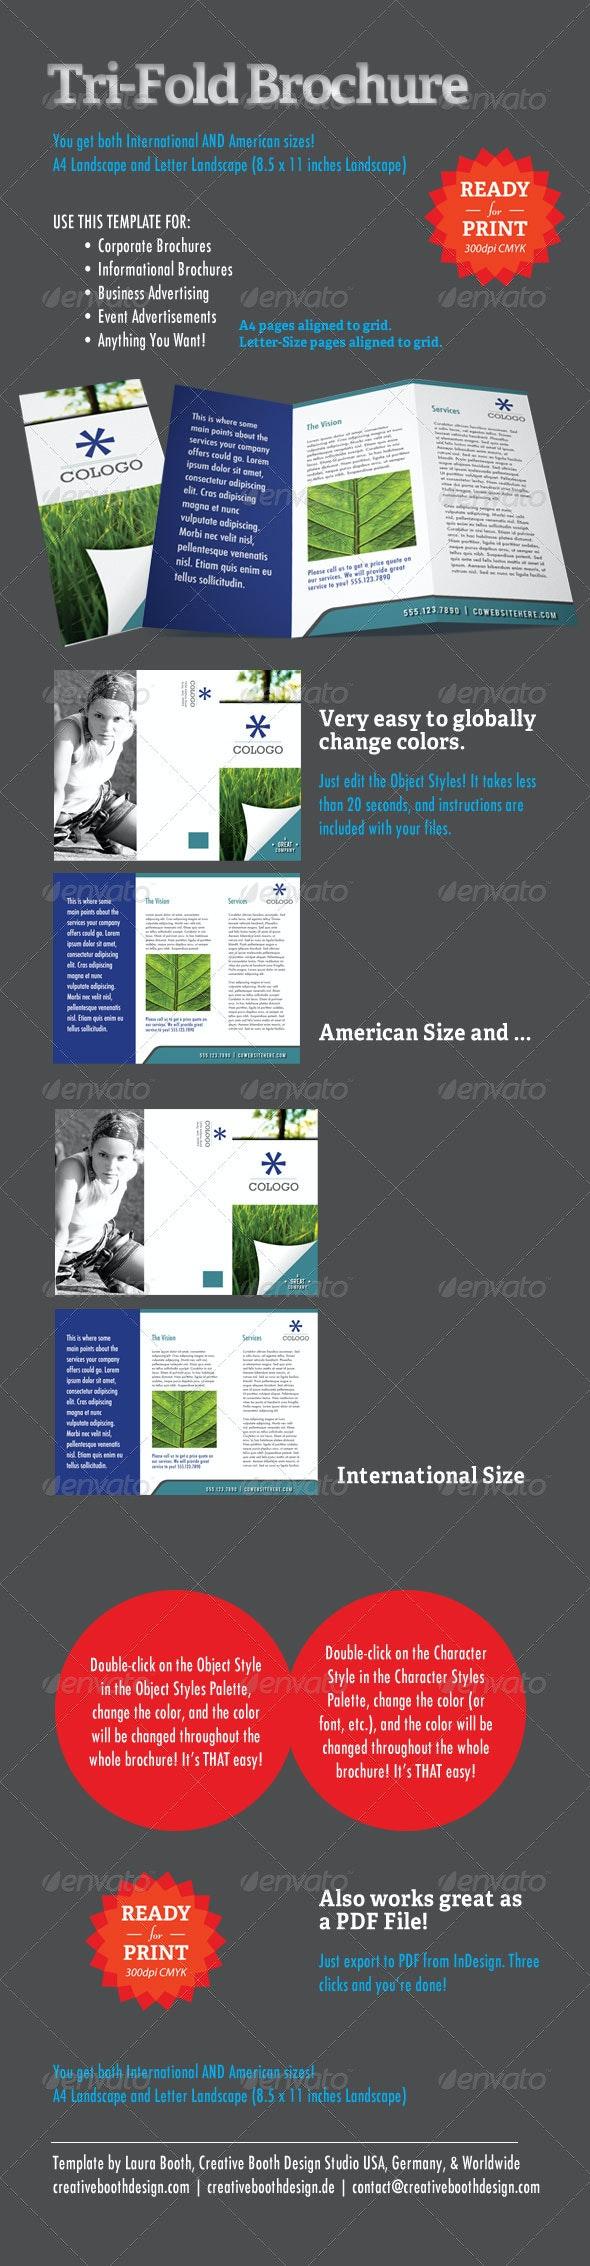 Tri-Fold Brochure InDesign Template - Brochures Print Templates